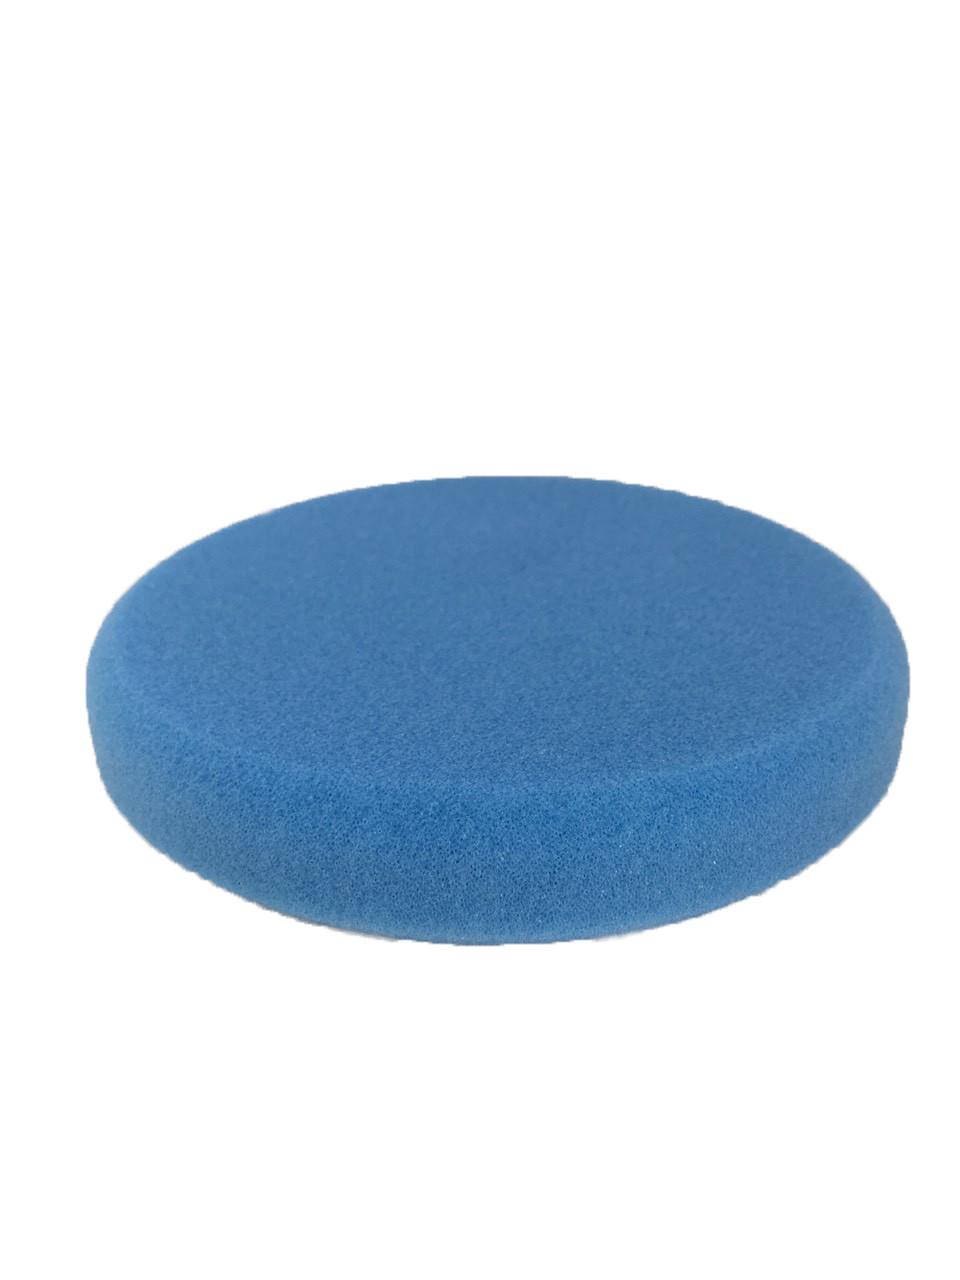 Полировальный круг жесткий-антиголограмный - Hydro-Tech Cyan Heavy Polishing Foam 125 мм (H2O-9255-130MM)